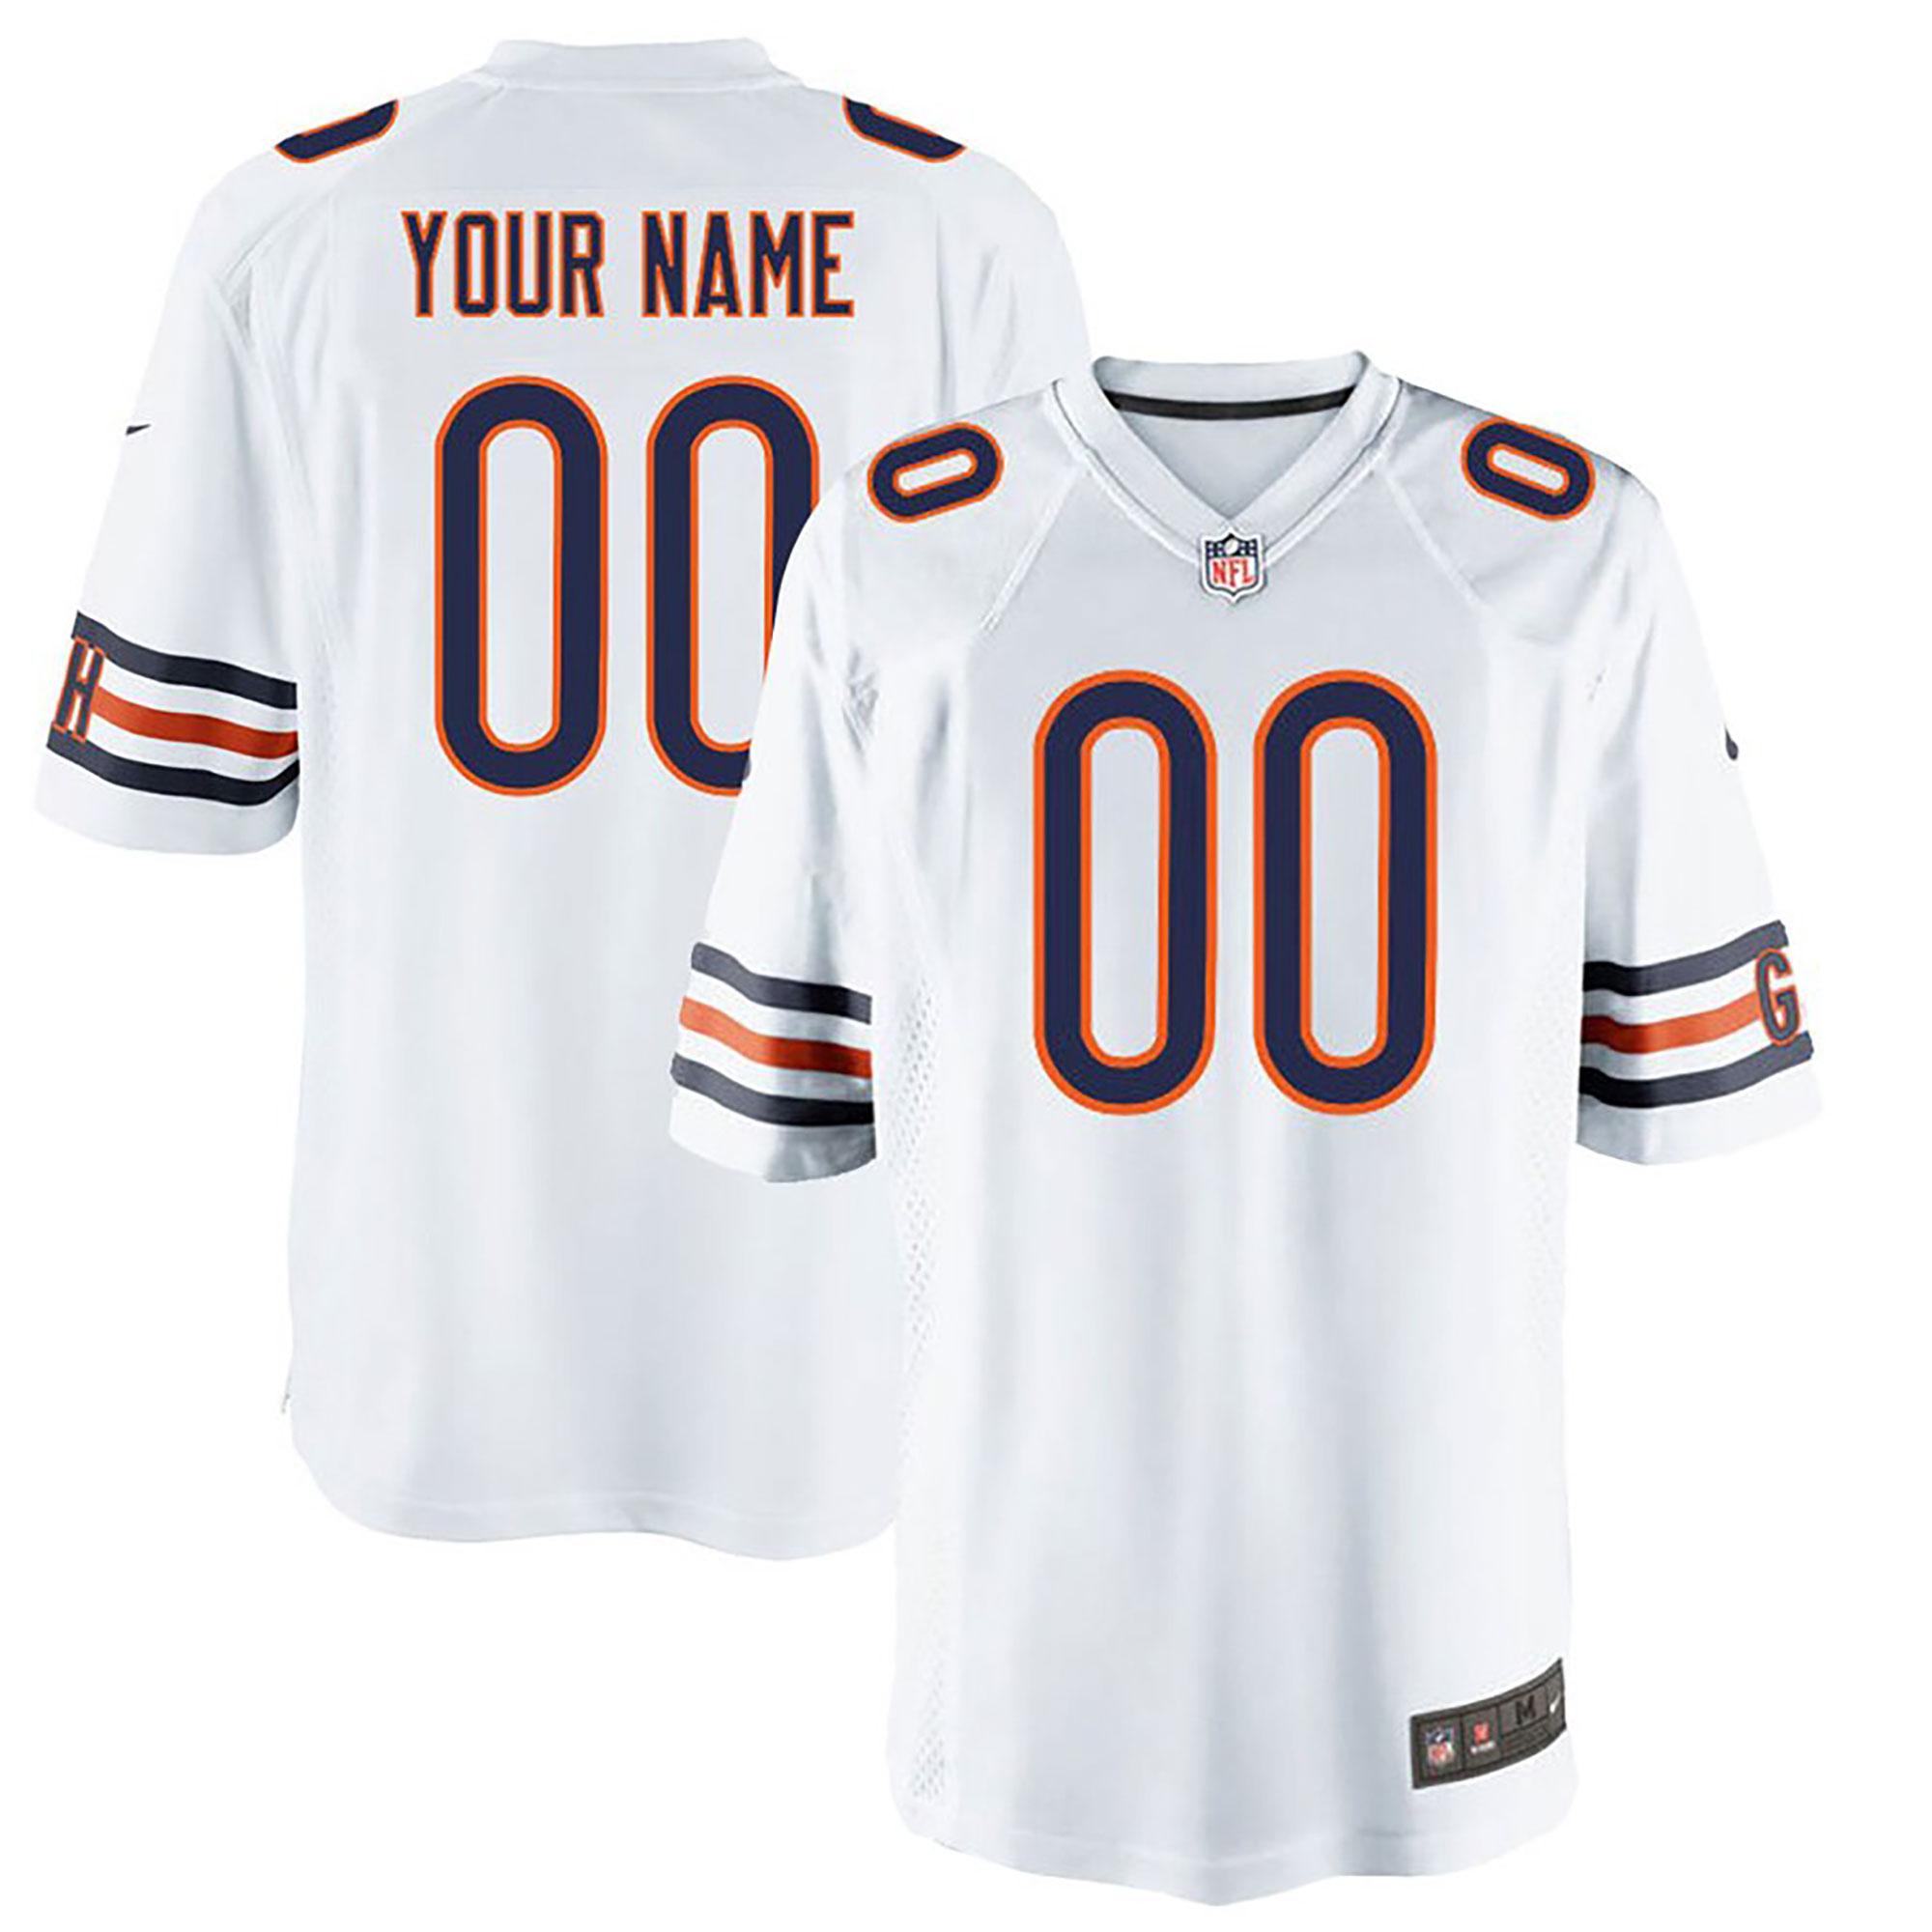 Chicago Bears Road Game Jersey - Custom - Mens